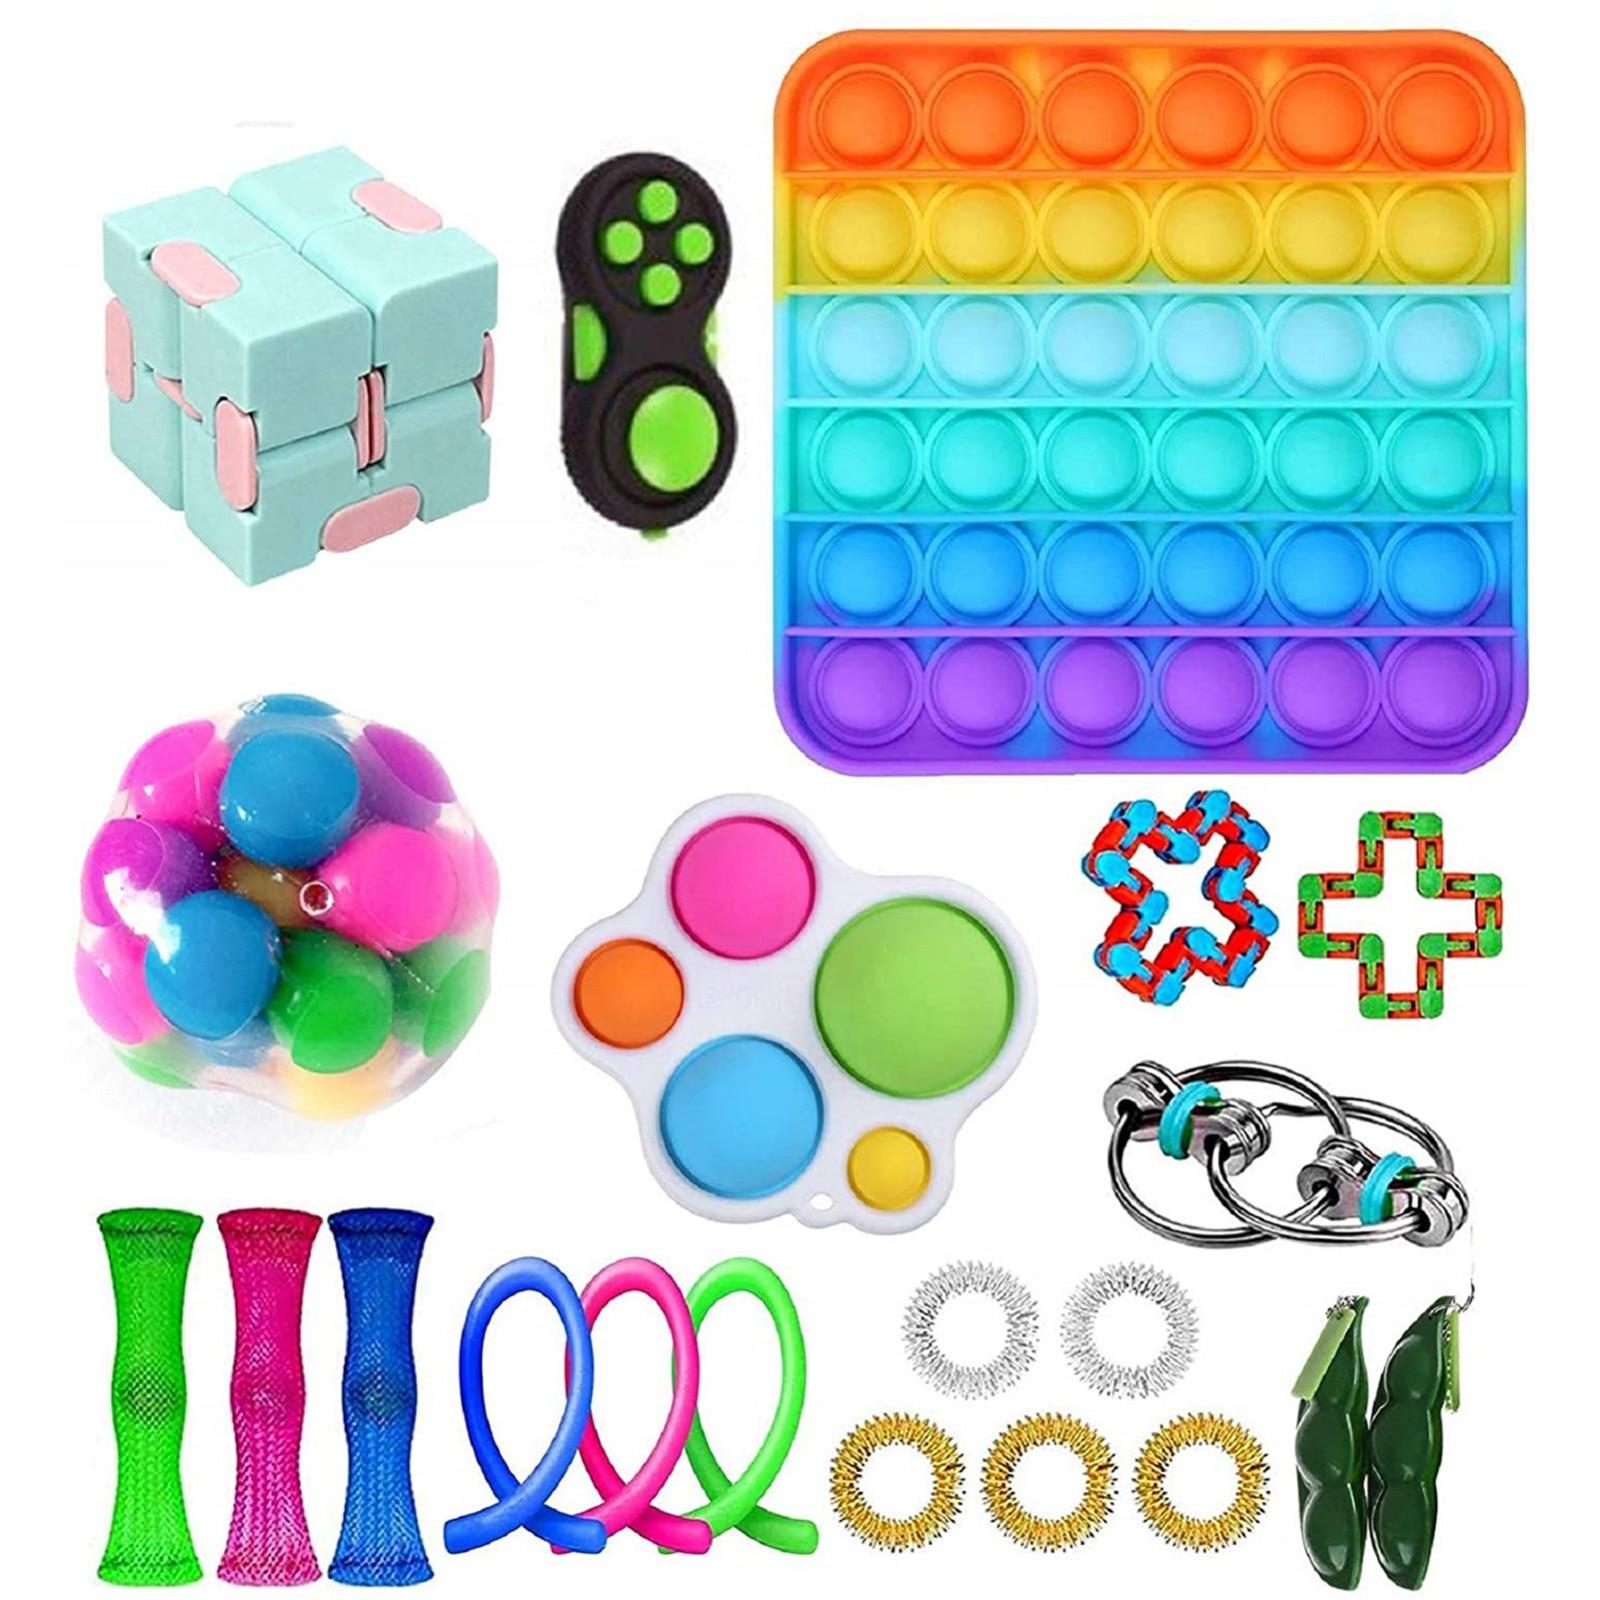 29/25Pcs Fidget Toy Set Cheap Sensory Fidget Toys Pack for Kids or Adults Decompression img3